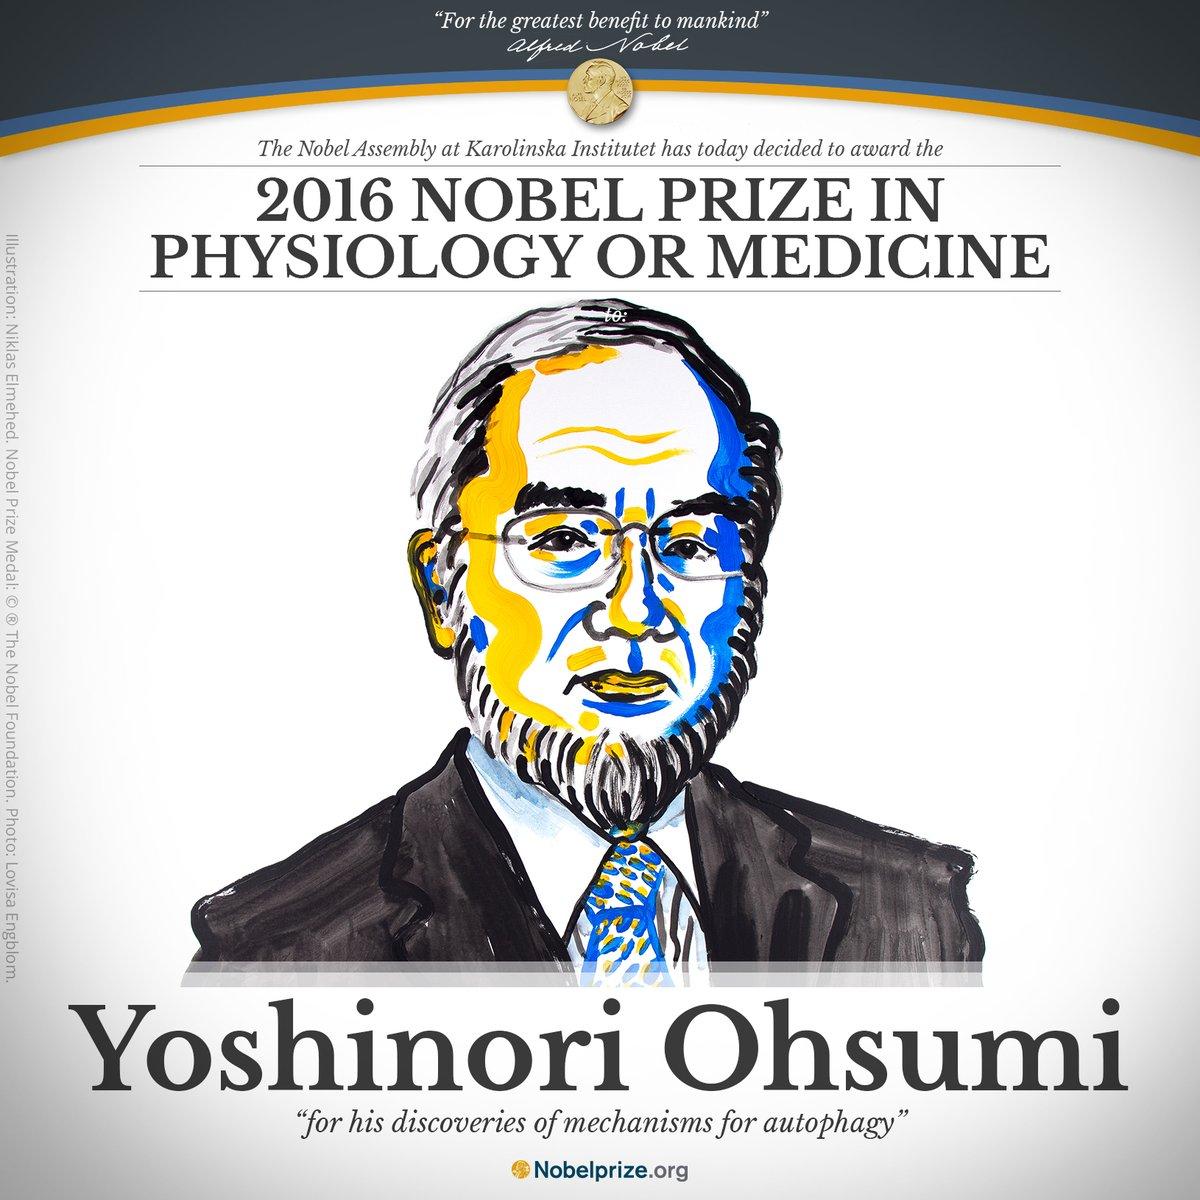 yoshinori ohsumi fasting nobel prize medicine autophagy